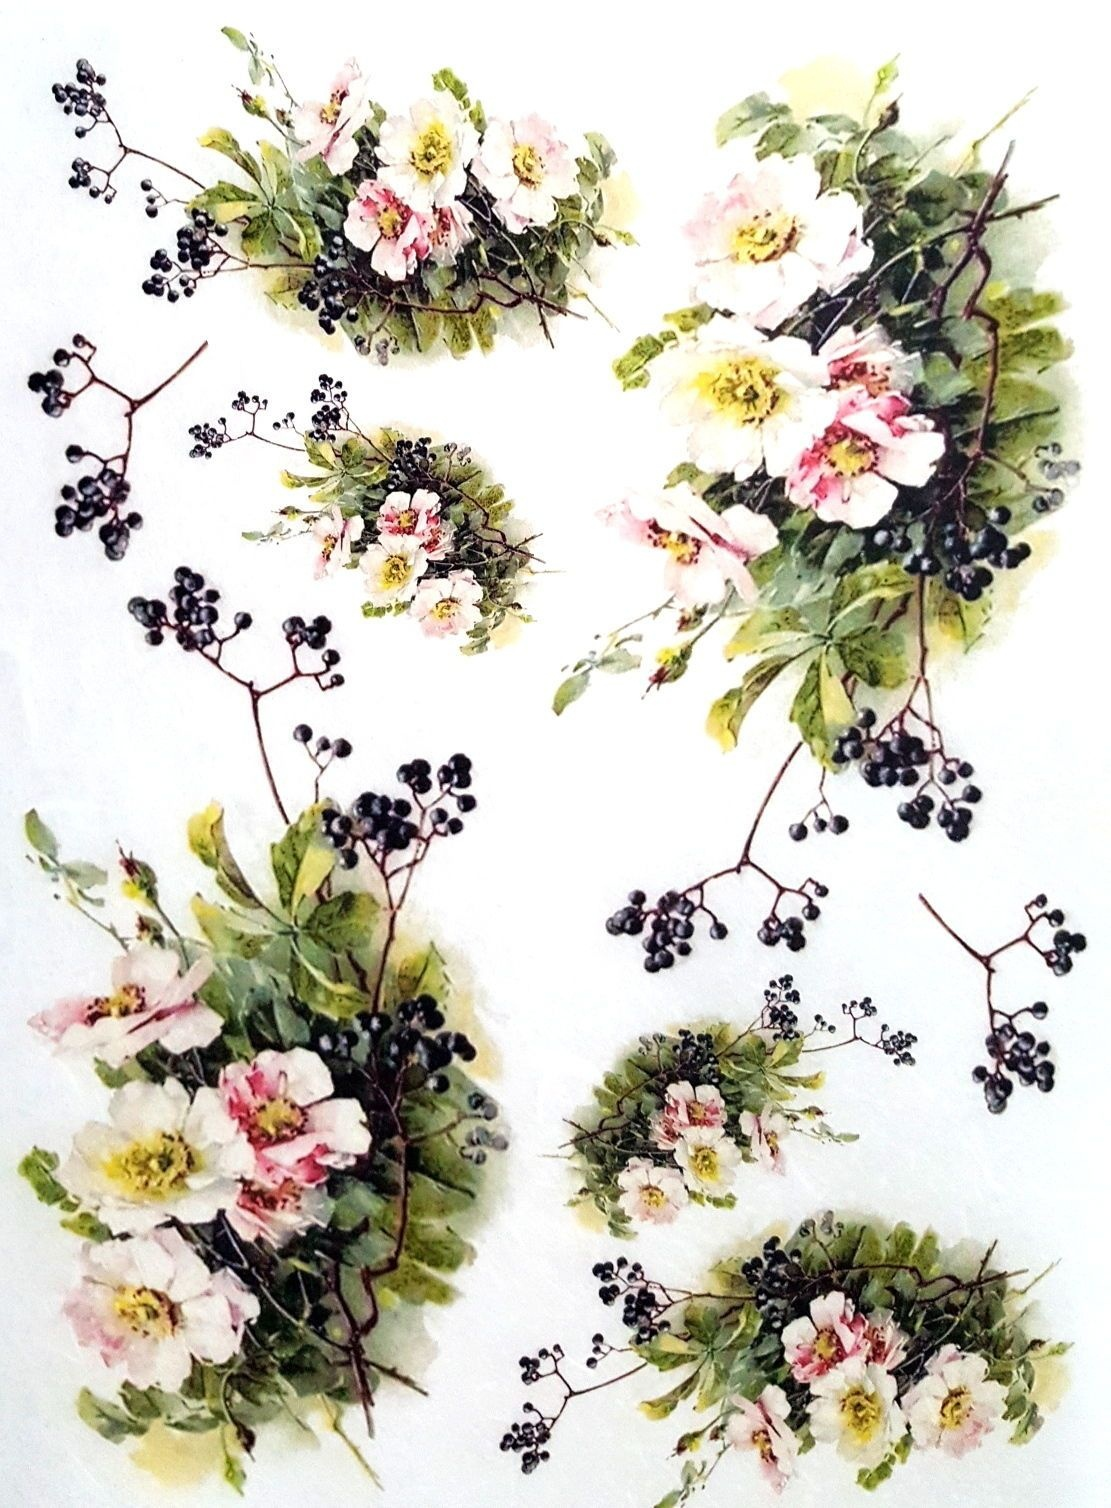 Rice Paper For Decoupage Scrapbooking Sheet Craft Vintage Garden - Free Printable Decoupage Flowers